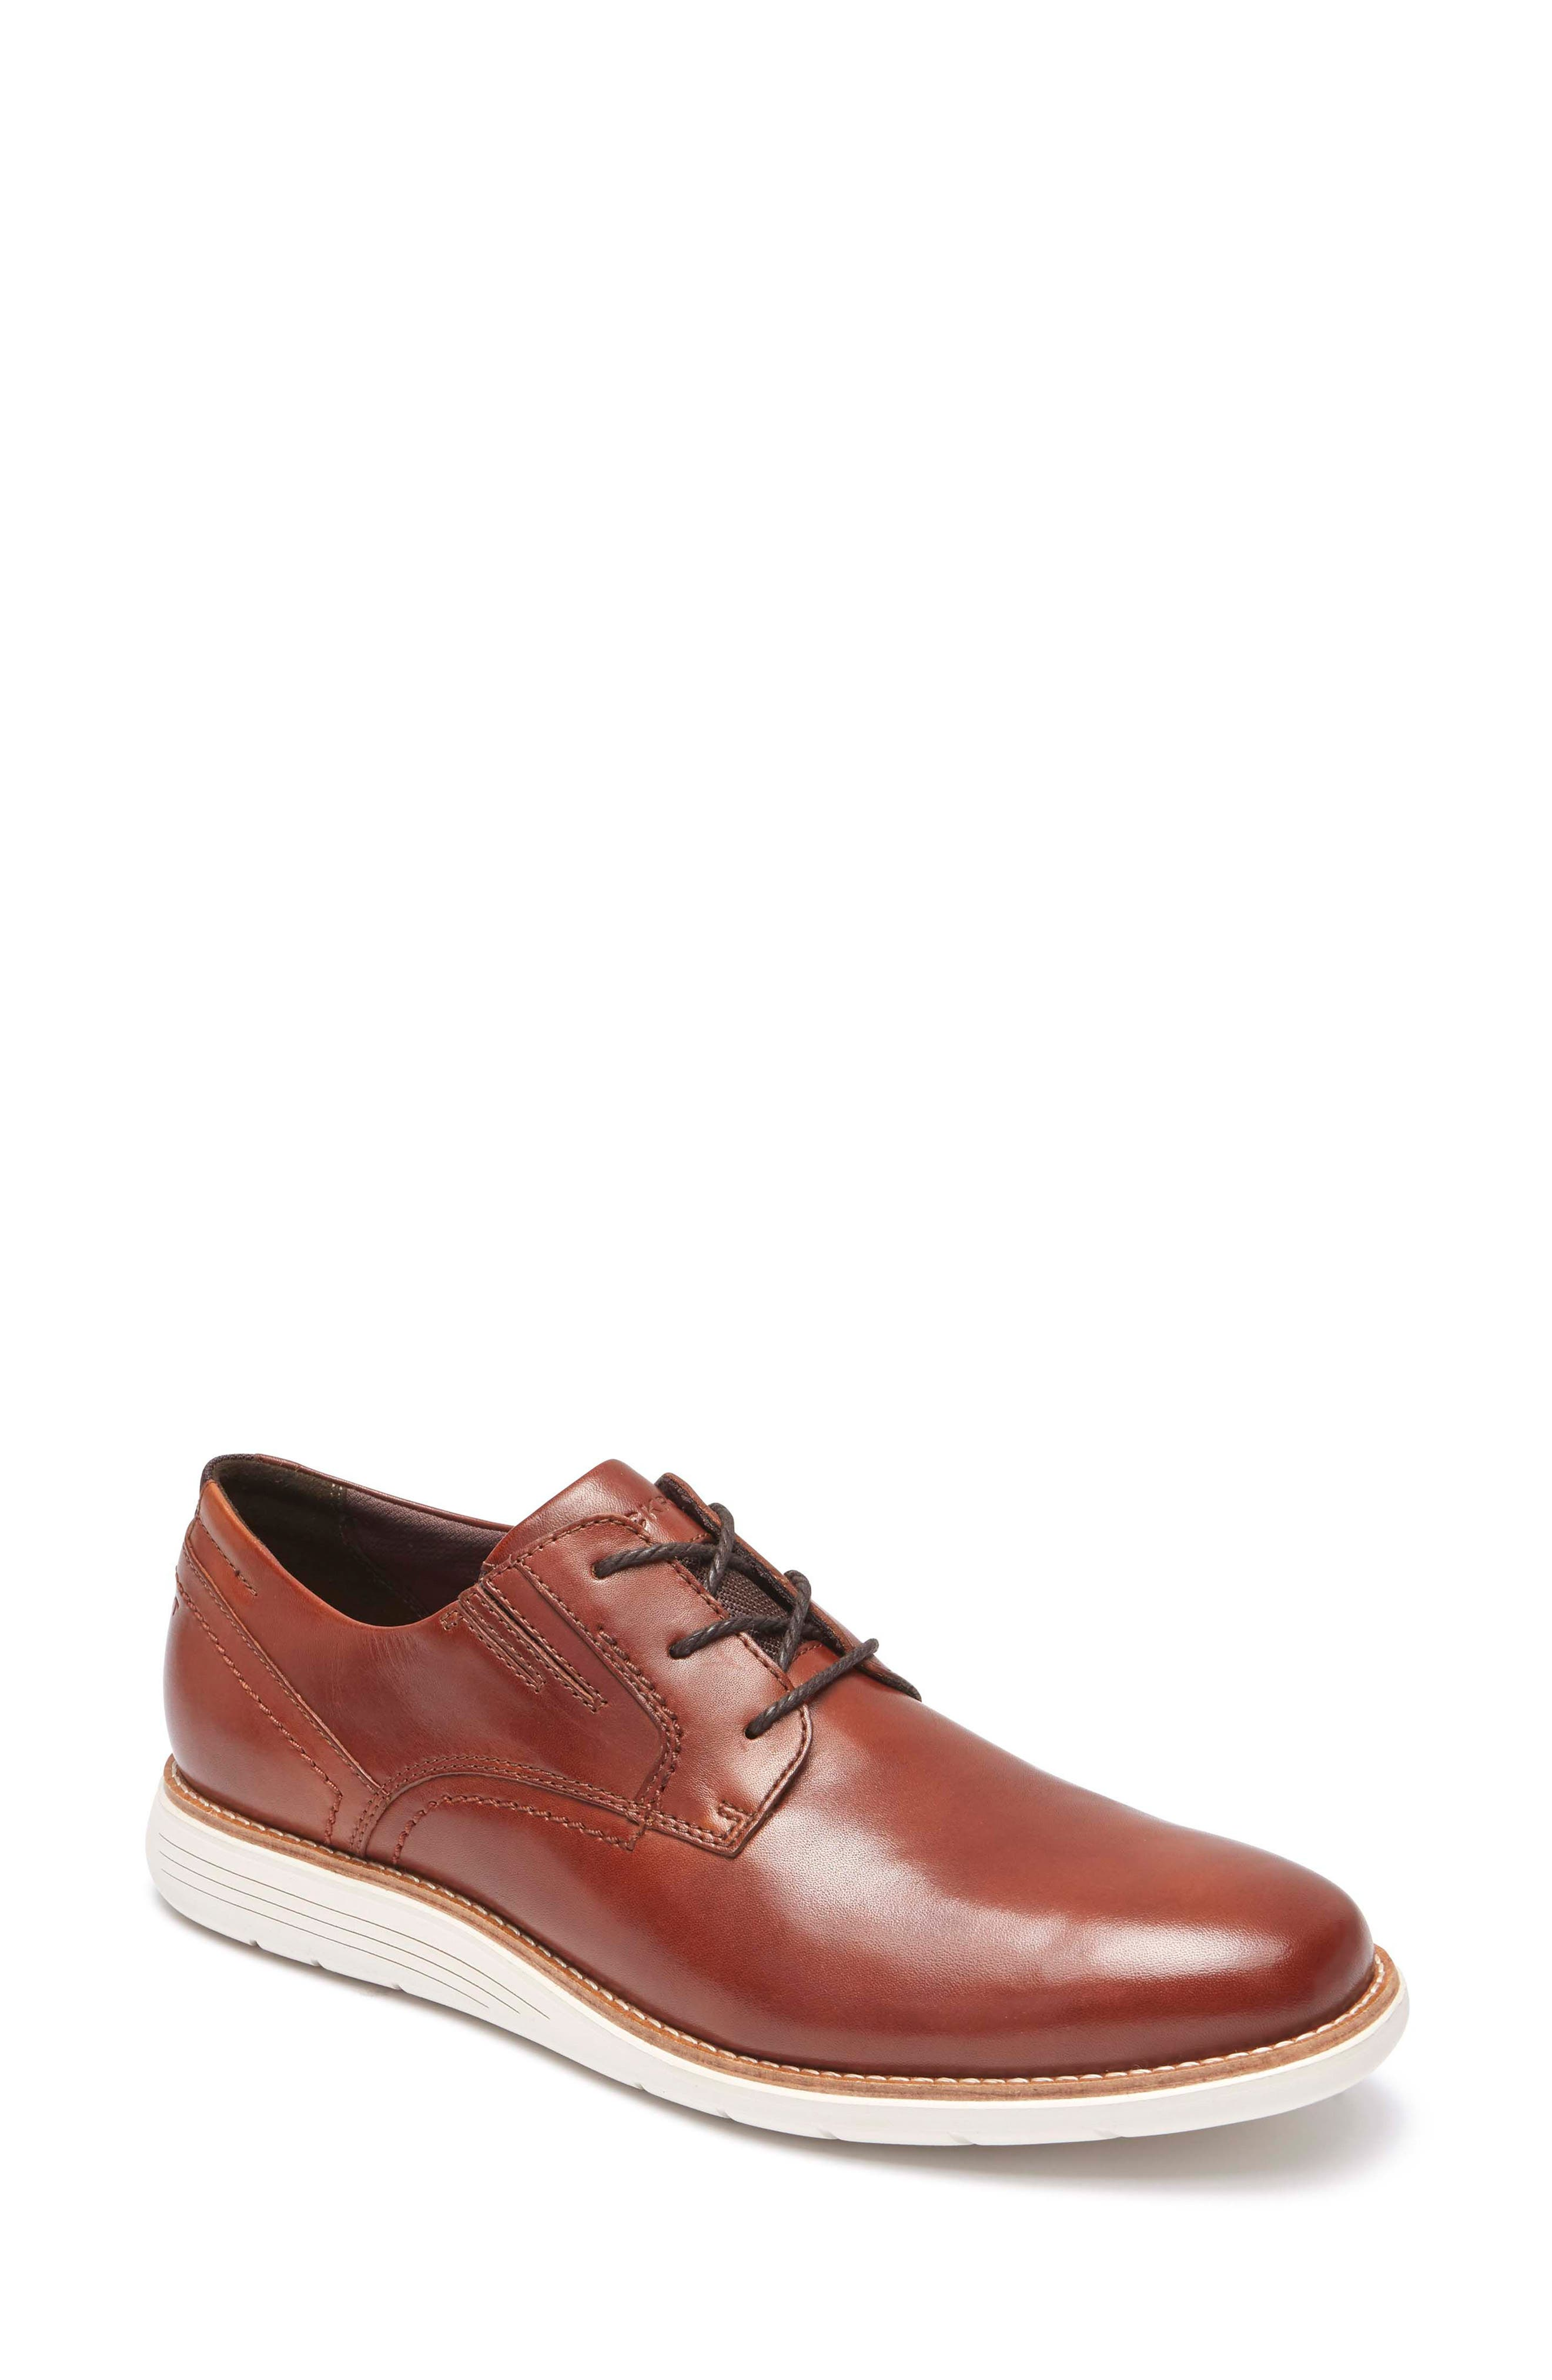 Total Motion Sport Plain Toe Derby,                         Main,                         color, Tan Leather